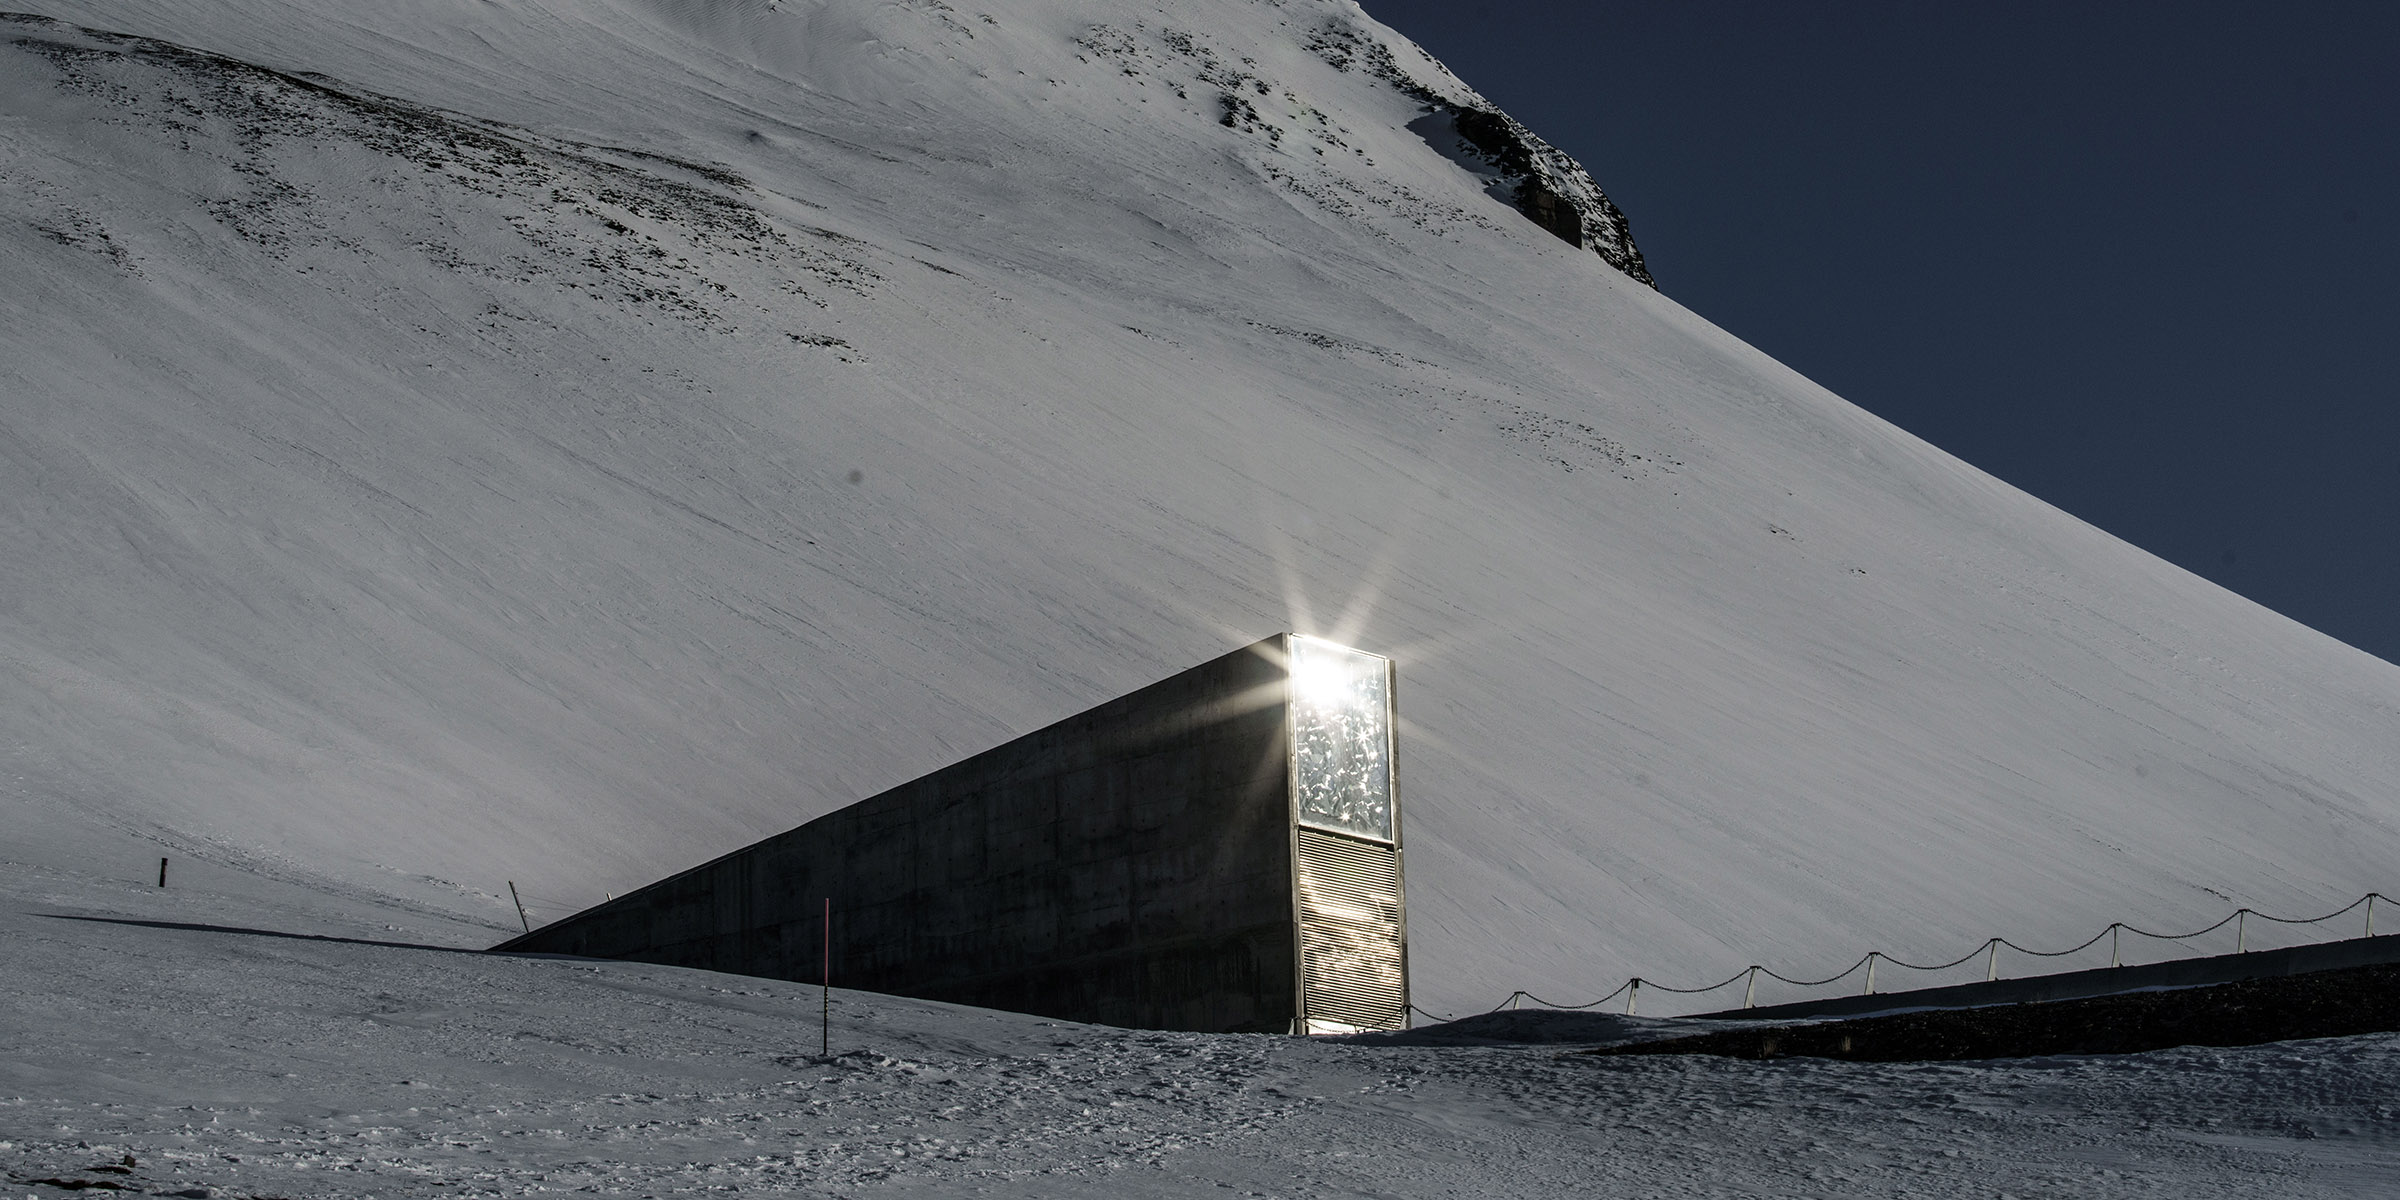 Entrance to the Svalbard Global Seed Vault, Norway, 2016. Photograph by Jonas Bendiksen. © Jonas Bendiksen/Magnum Photos.